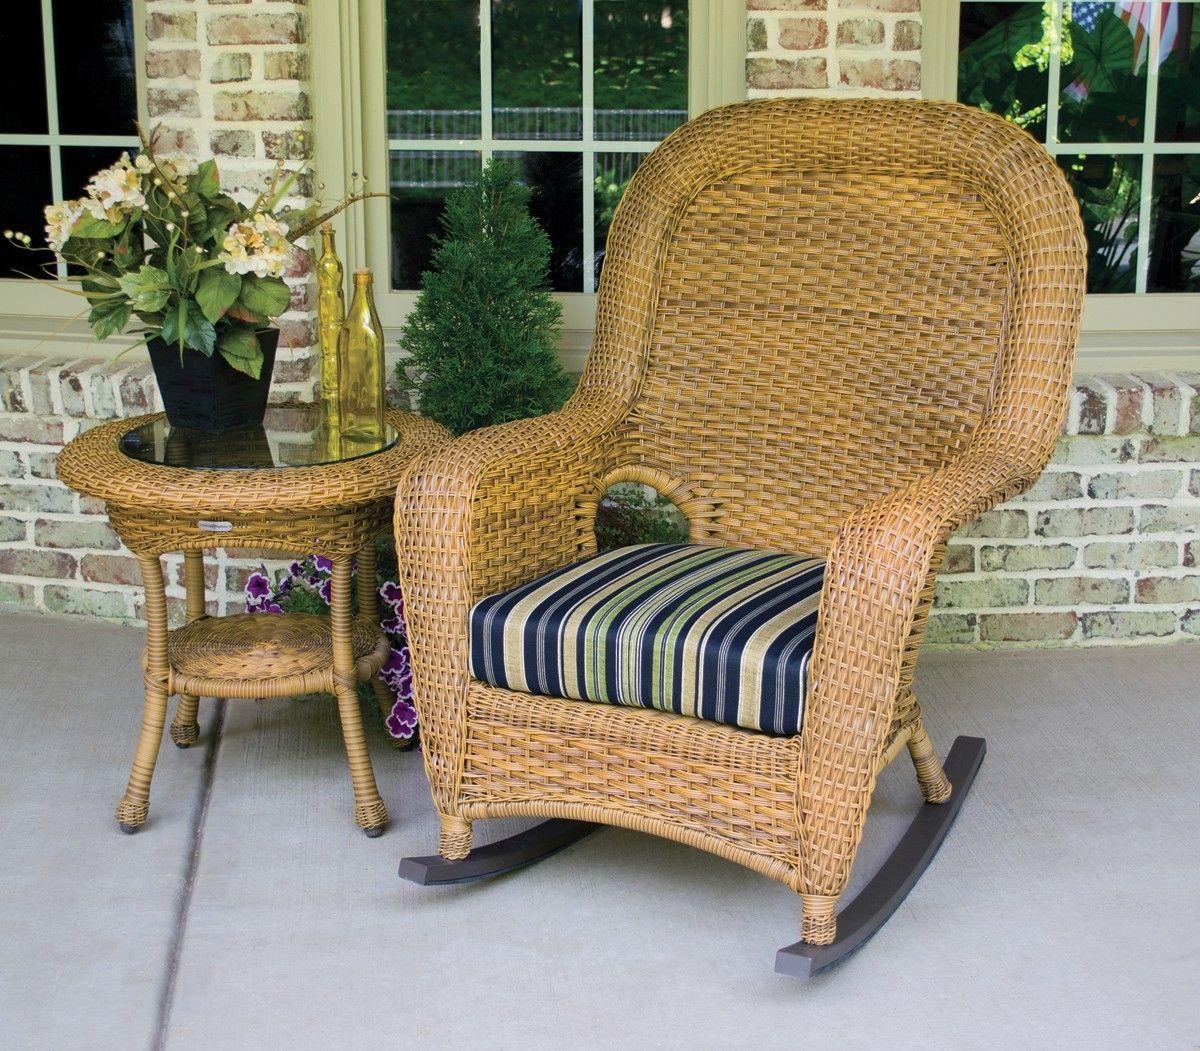 #78 - Outdoor Patio Garden Furniture Mojave Resin Wicker Rocking Chair & Table Bundle in Vera Cruz